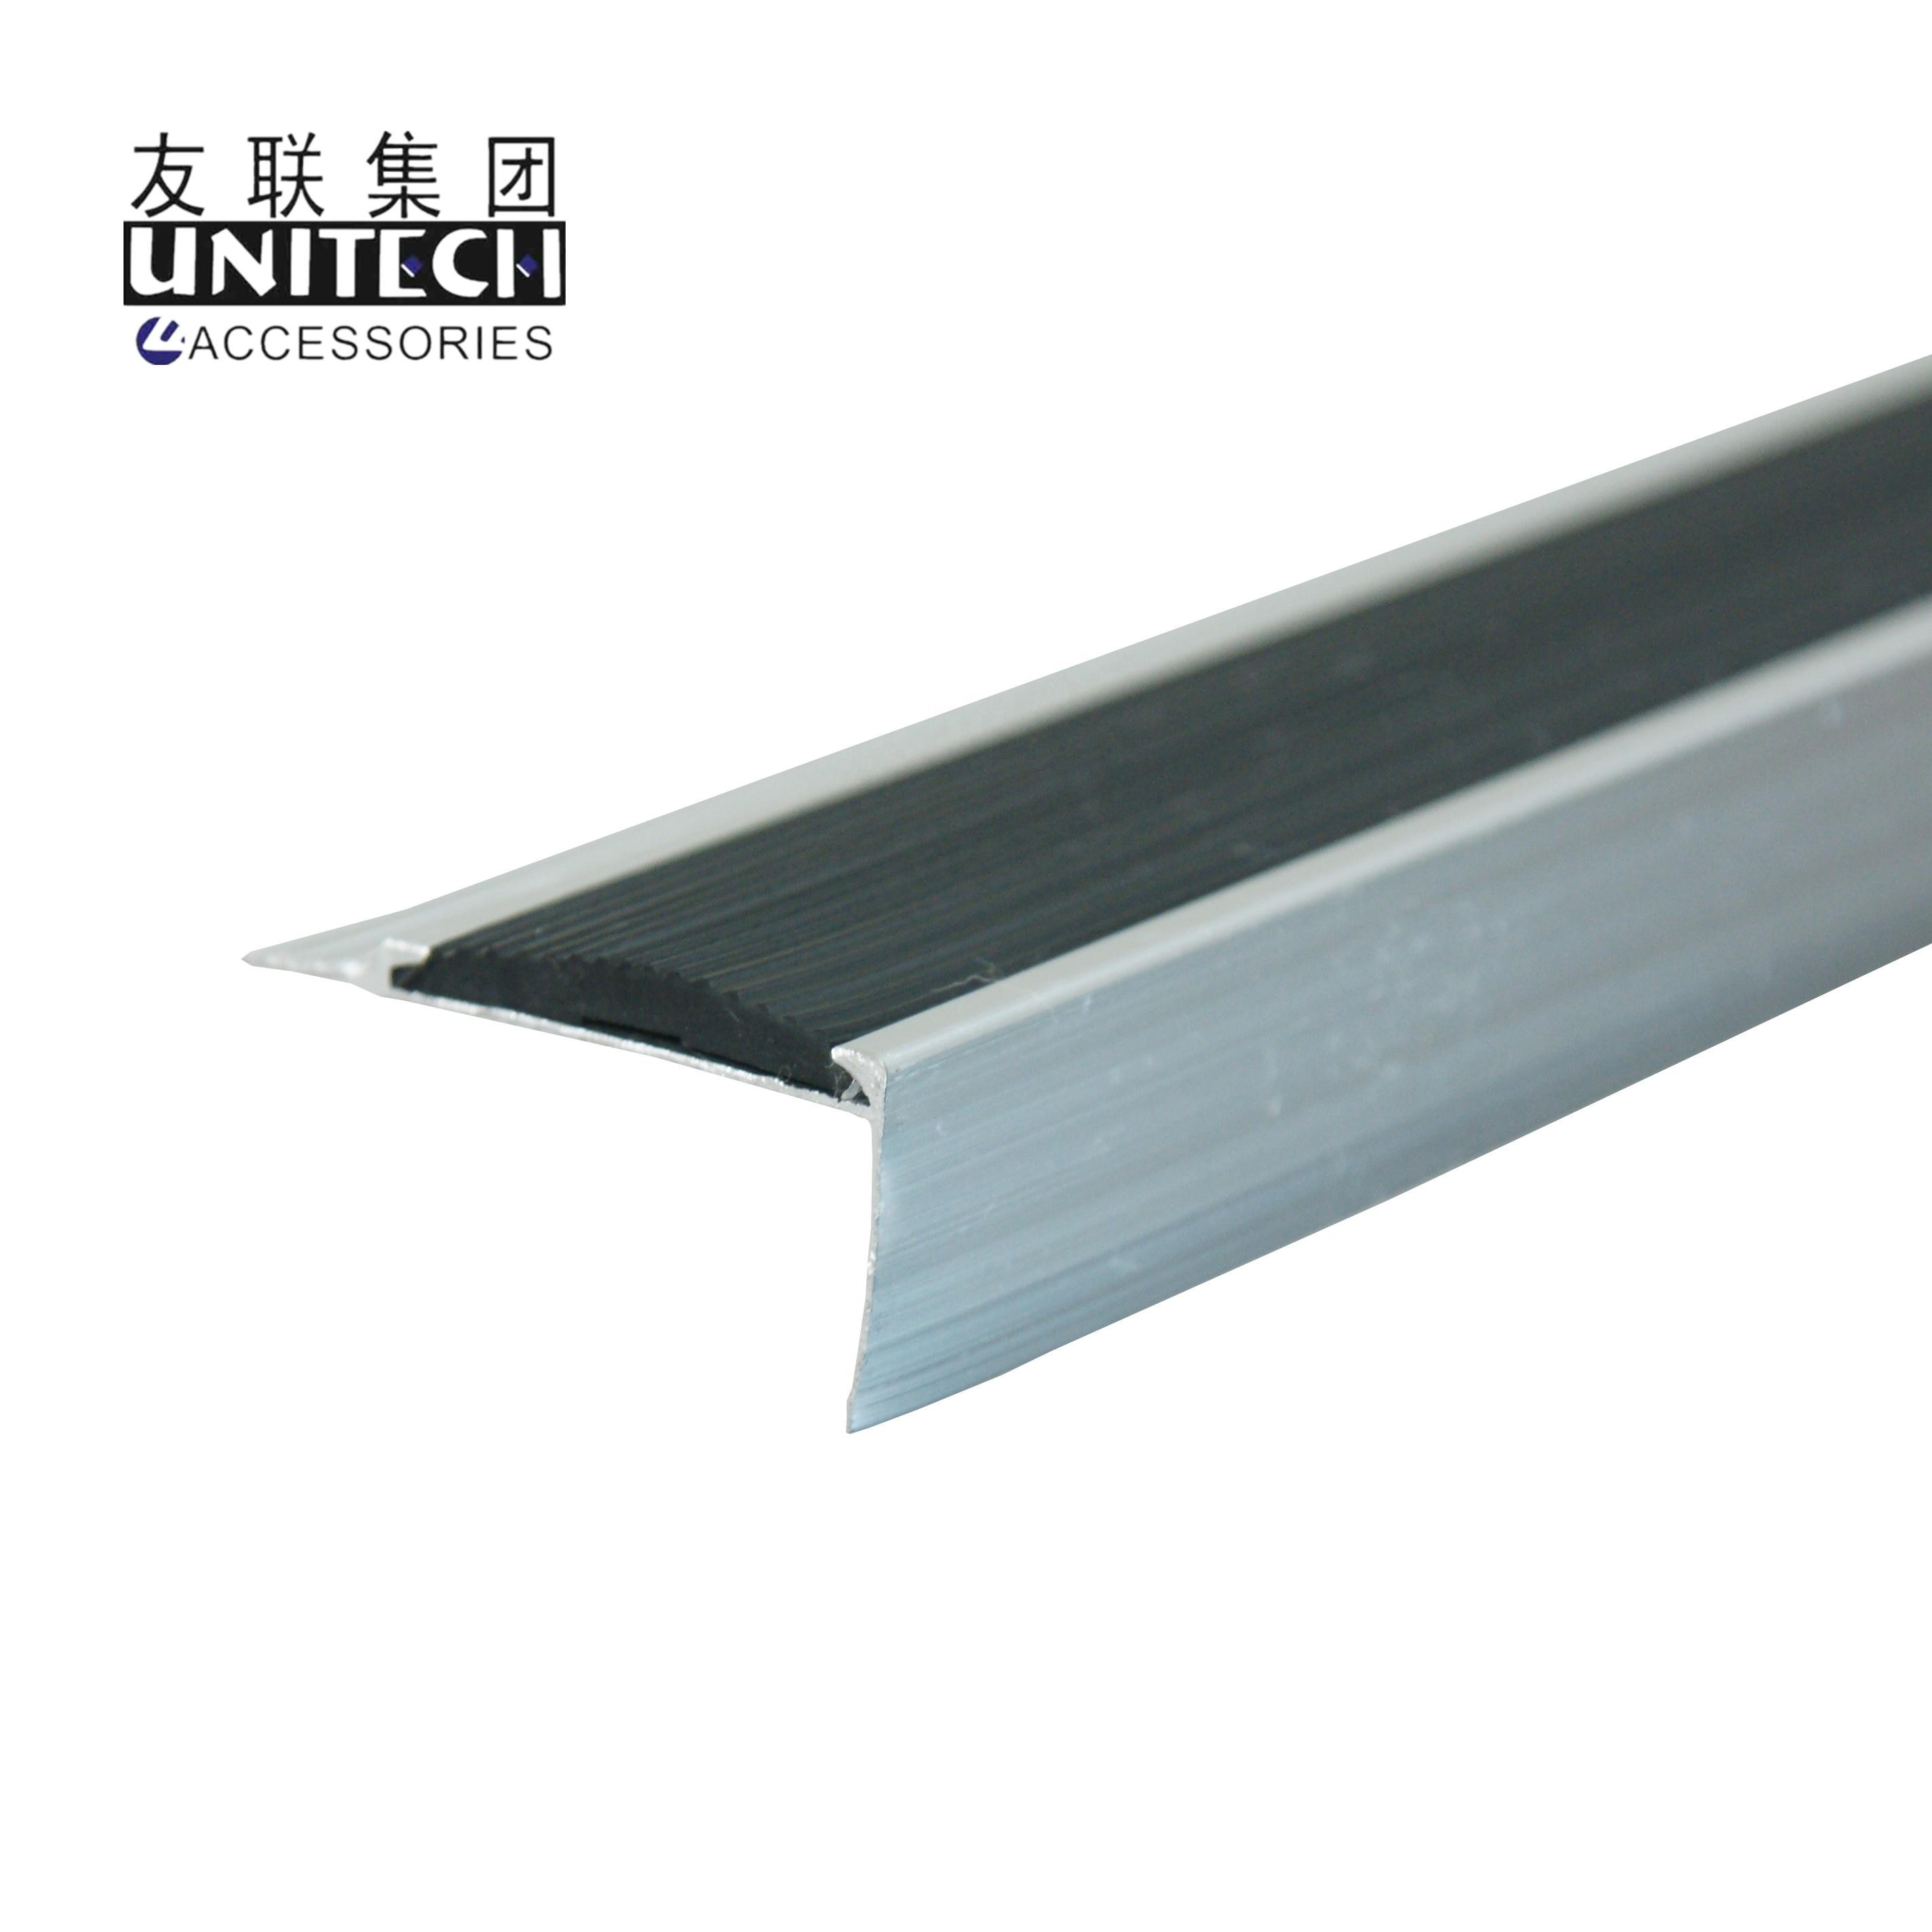 Aluminum Stair Edging Step Nosing Strip Metal Tread Nose Buy Aluminum Stair Edging Step Nosing Strip Metal Tread Nose Product On Alibaba Com